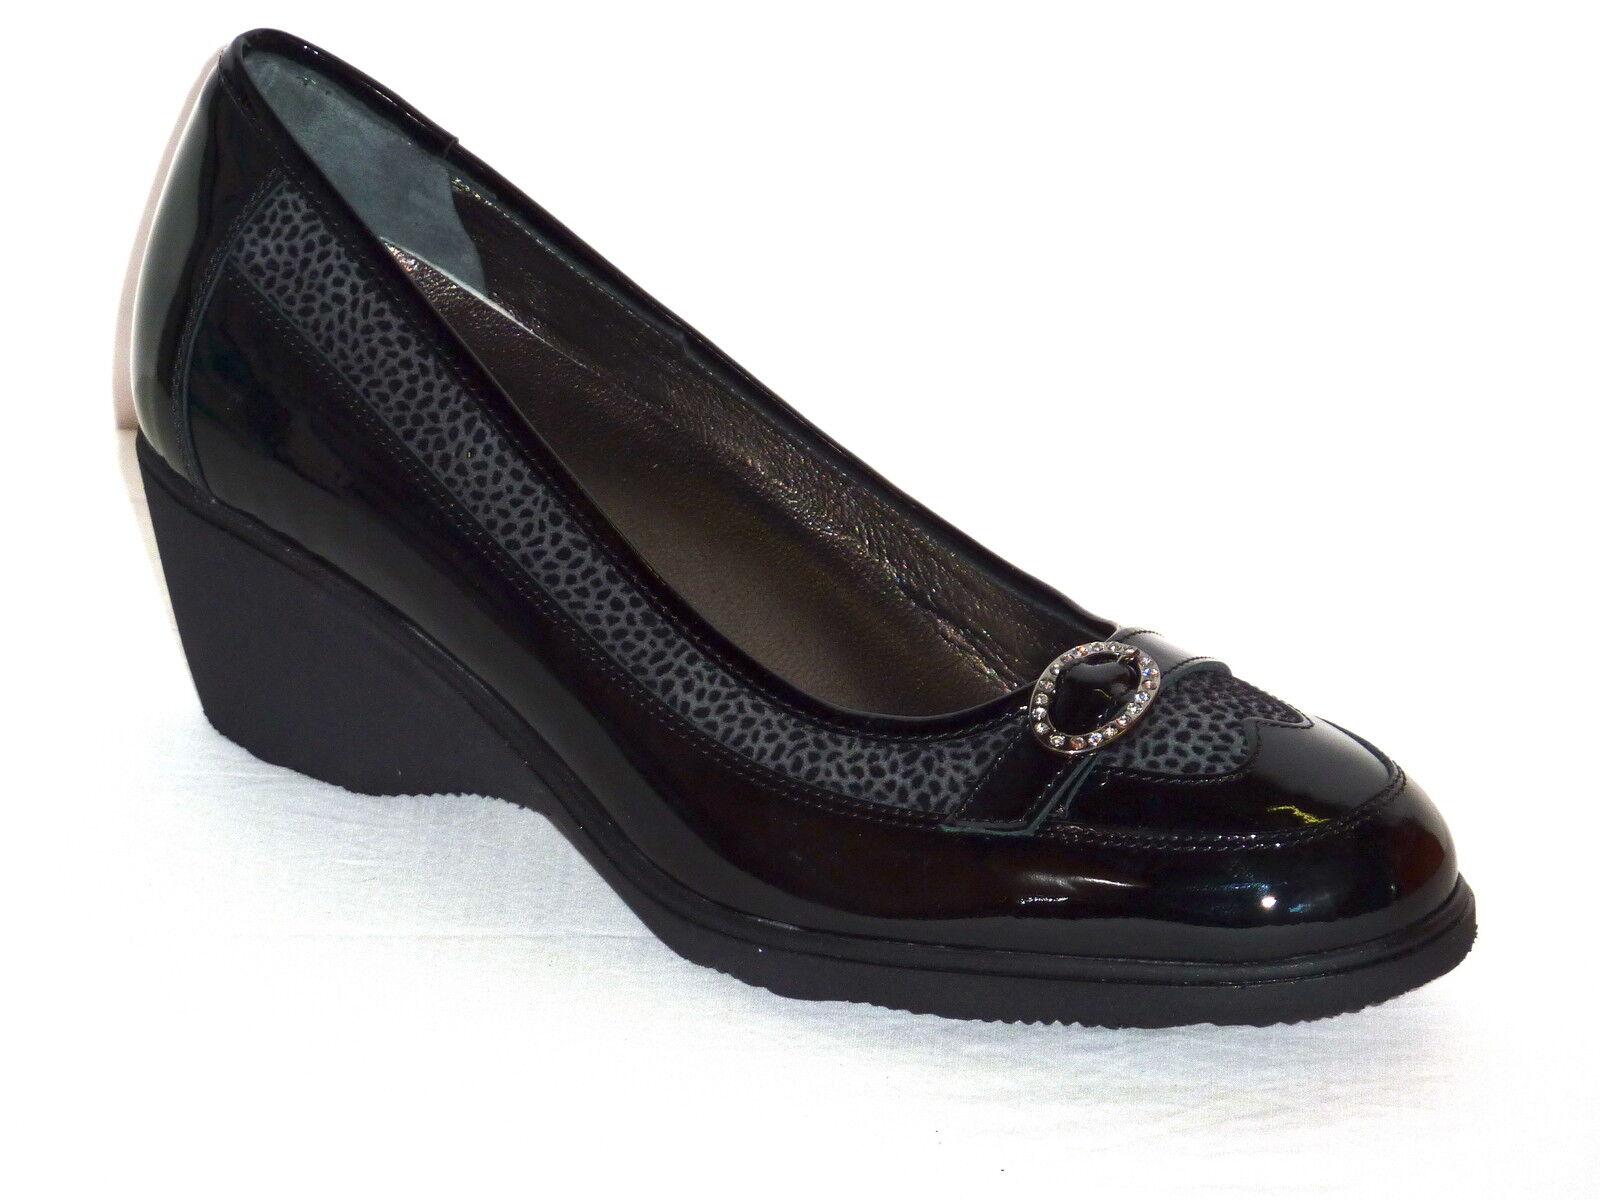 zapatos mujer ELEGANTI ELEGANTI ELEGANTI MORBIDE CONFORT CON ZEPPA E PELLE VERNICE negro   n. 35 720b66